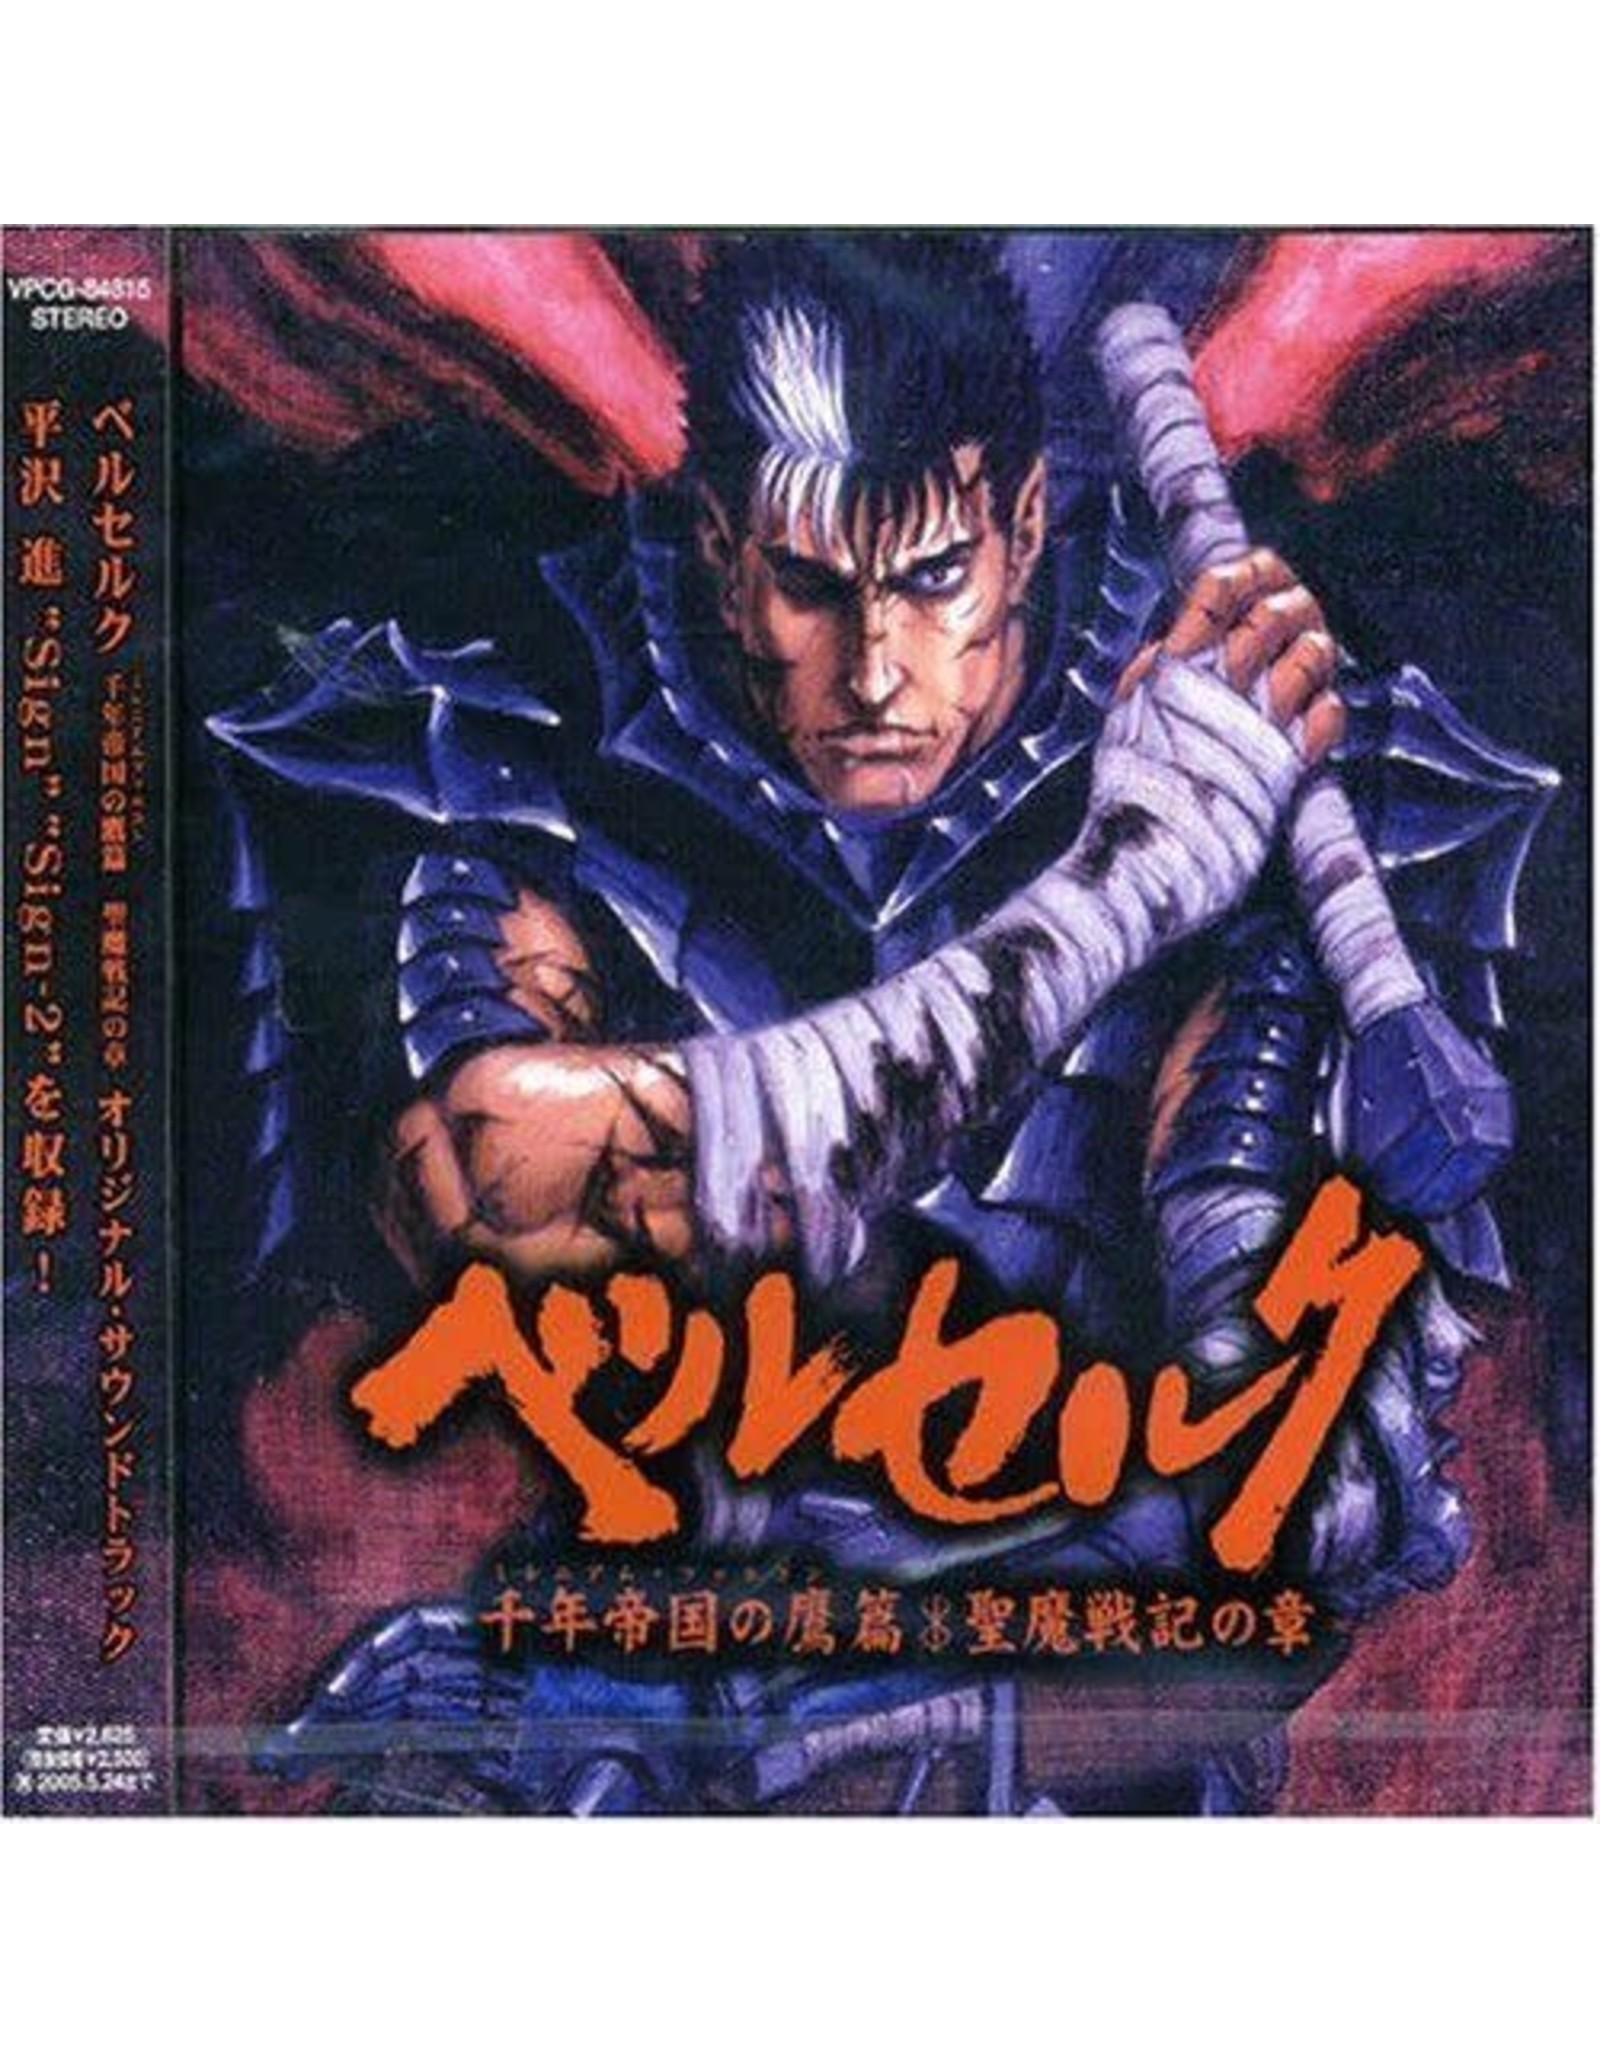 Playstation 2 Berserk Millennium Falcon Arc PS2 Original Soundtrack Game Music CD